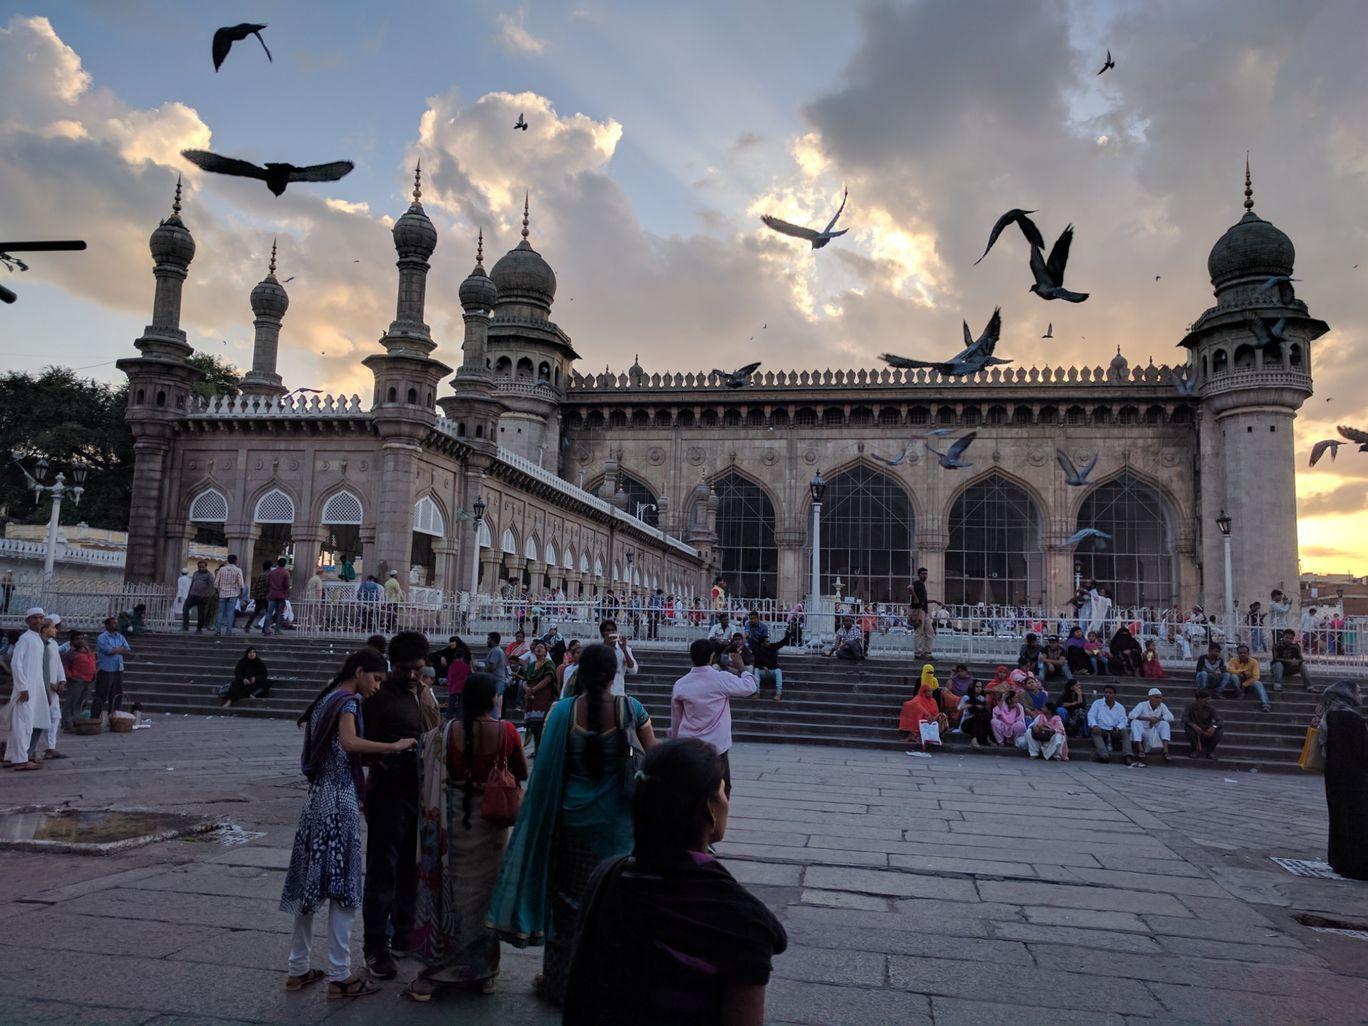 Photo of Mecca Masjid By Shubham Dutt Attri